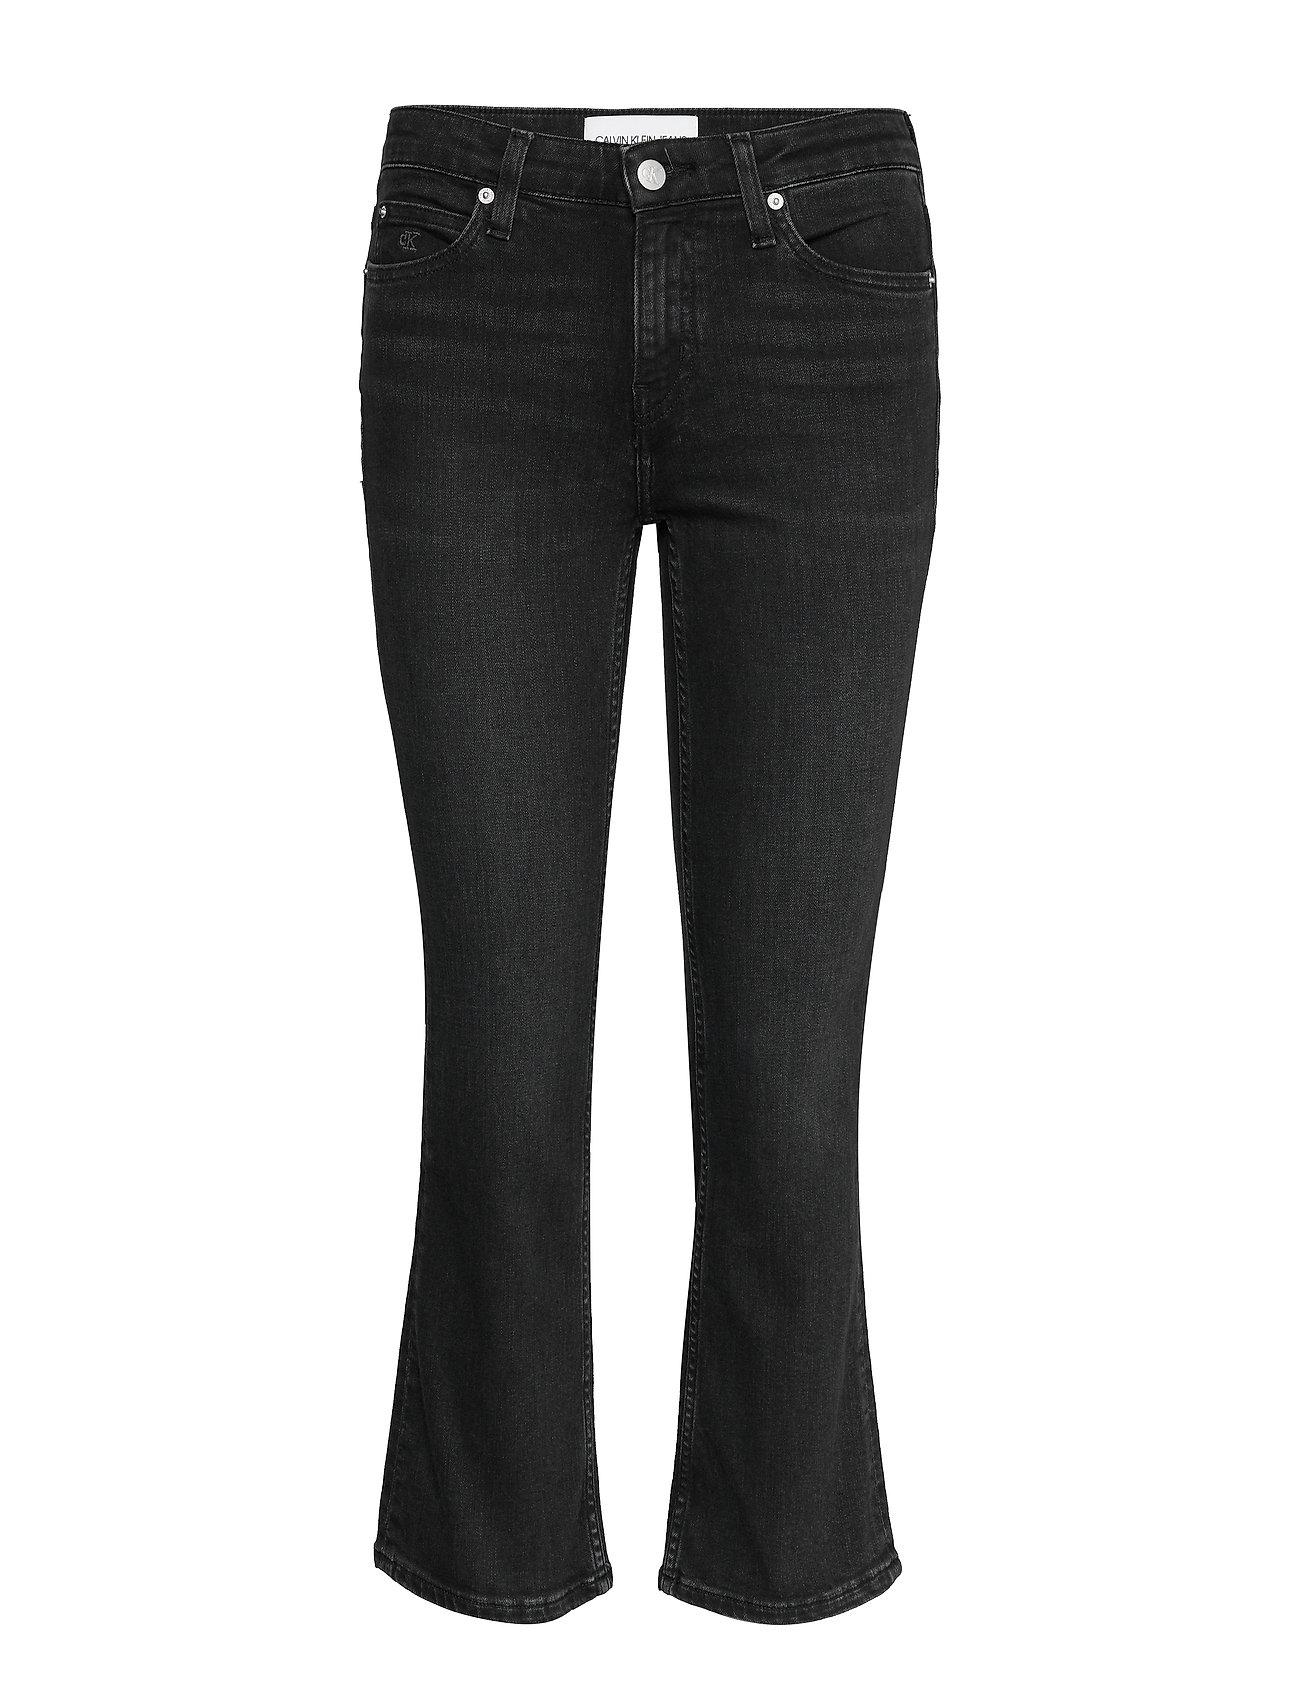 Calvin Klein Jeans MID RISE CROP FLARE - CA100 BLACK